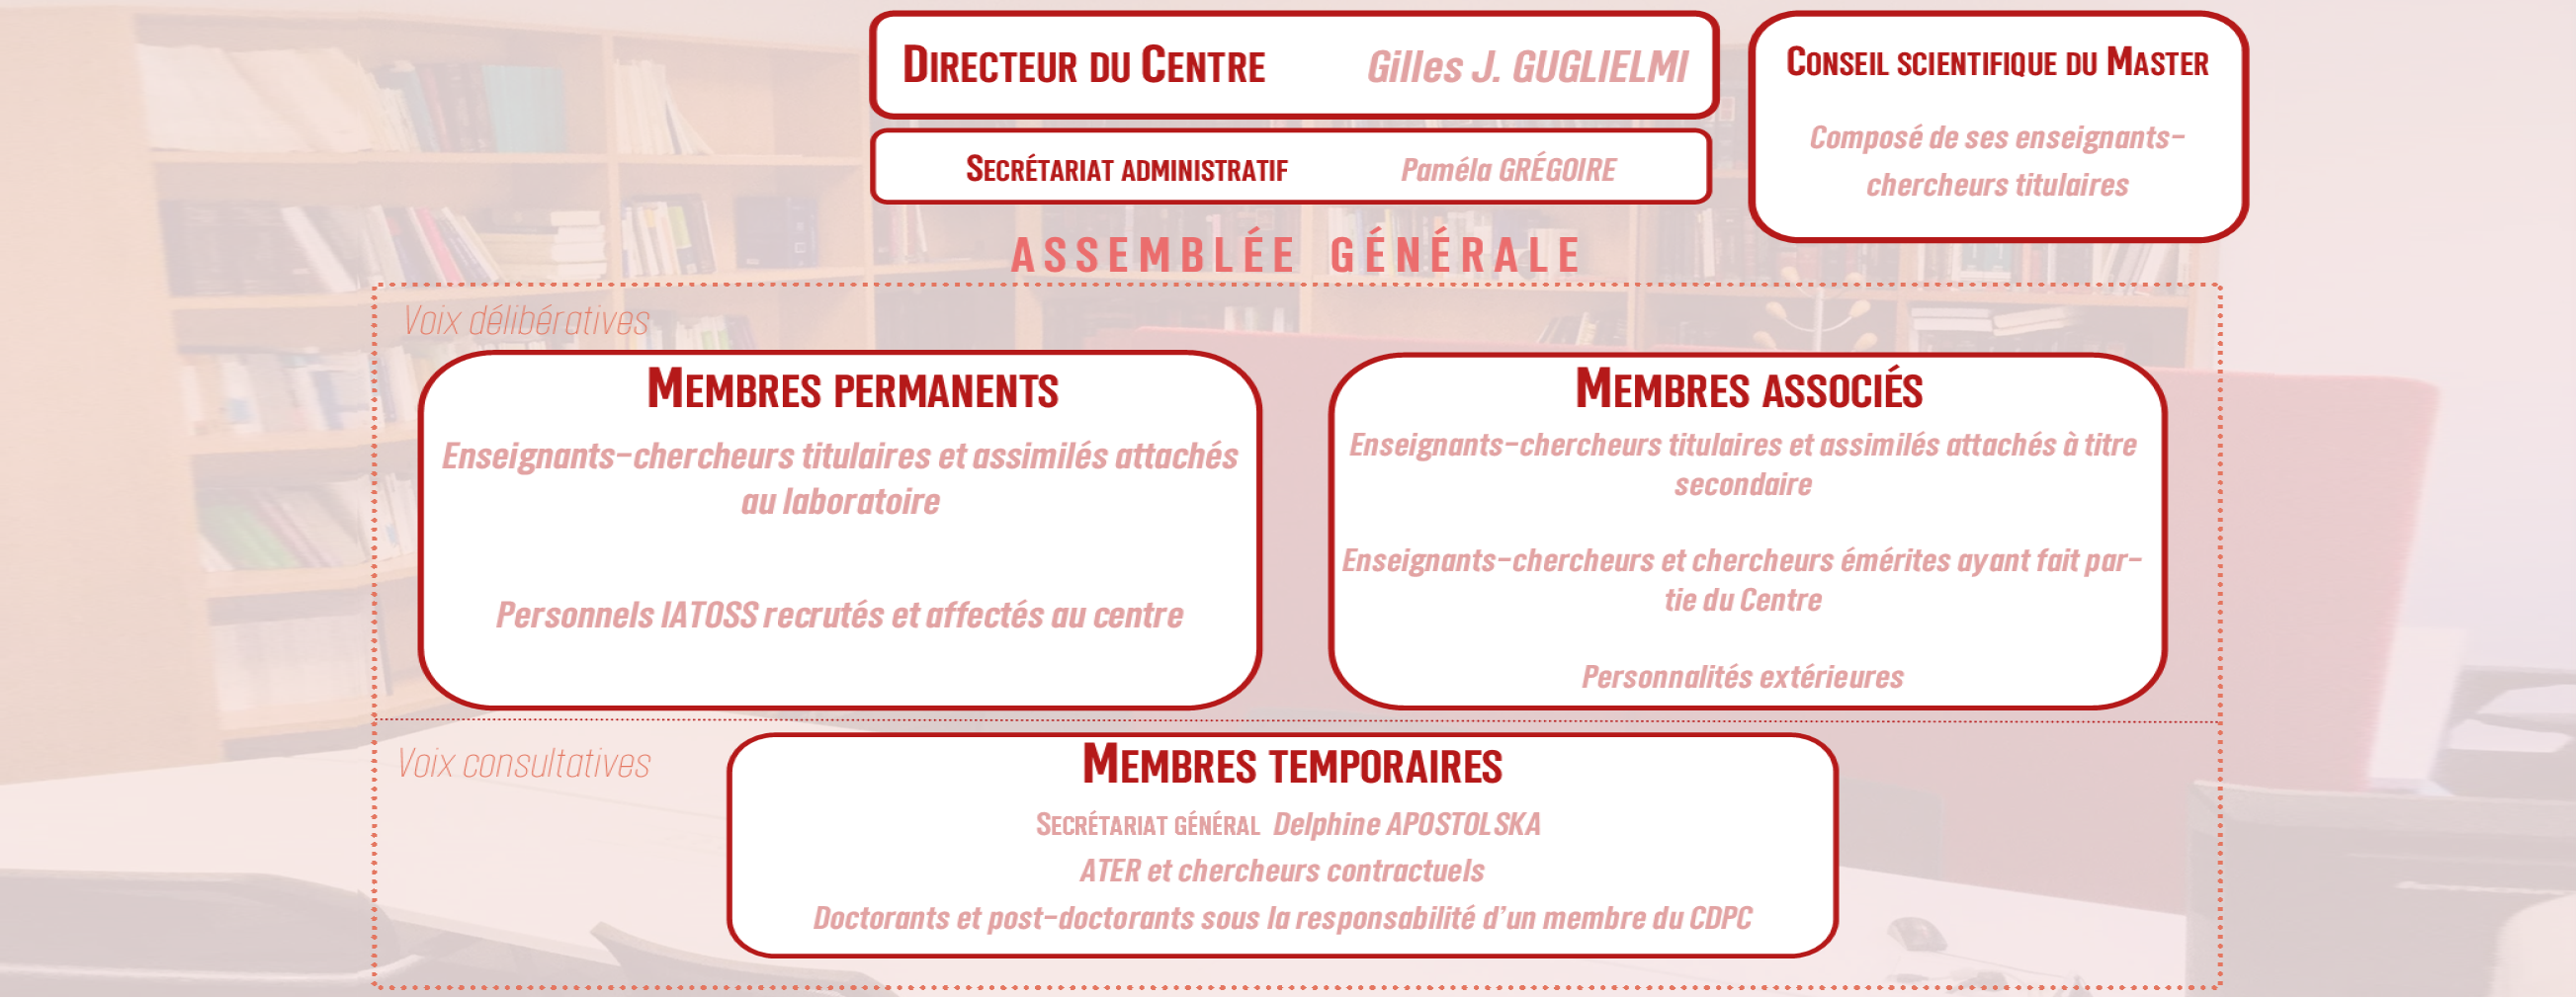 Organigramme du CDPC